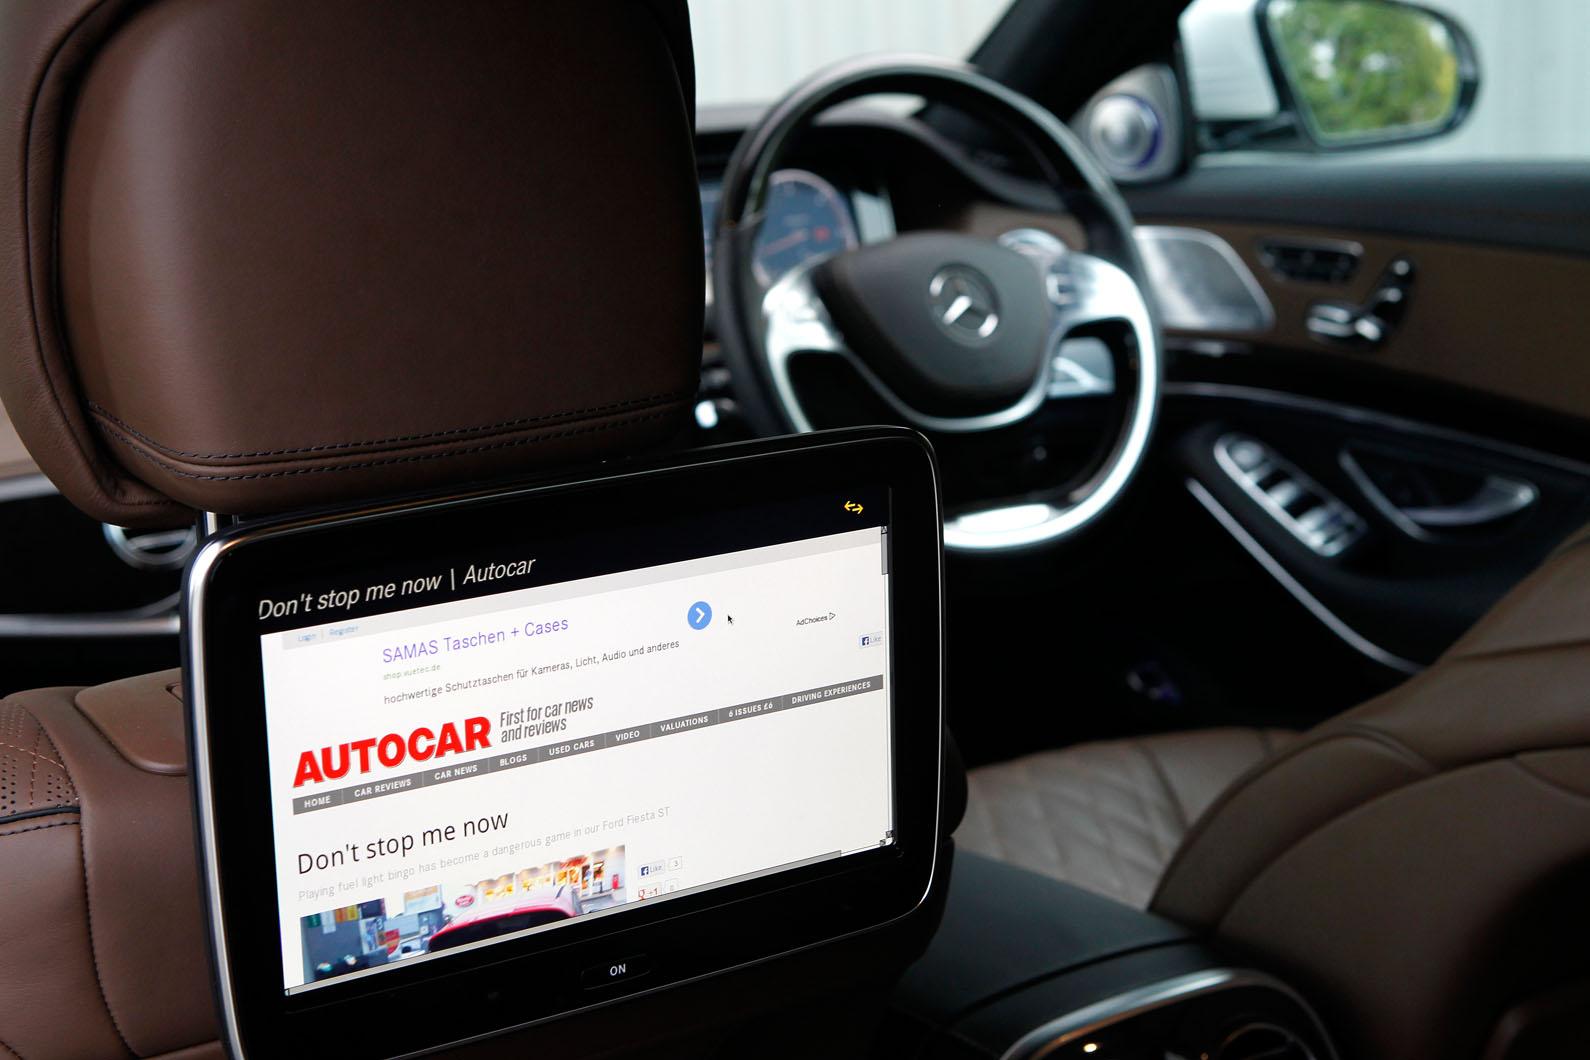 Mercedes benz s class design autocar for Mercedes benz rear seat entertainment system